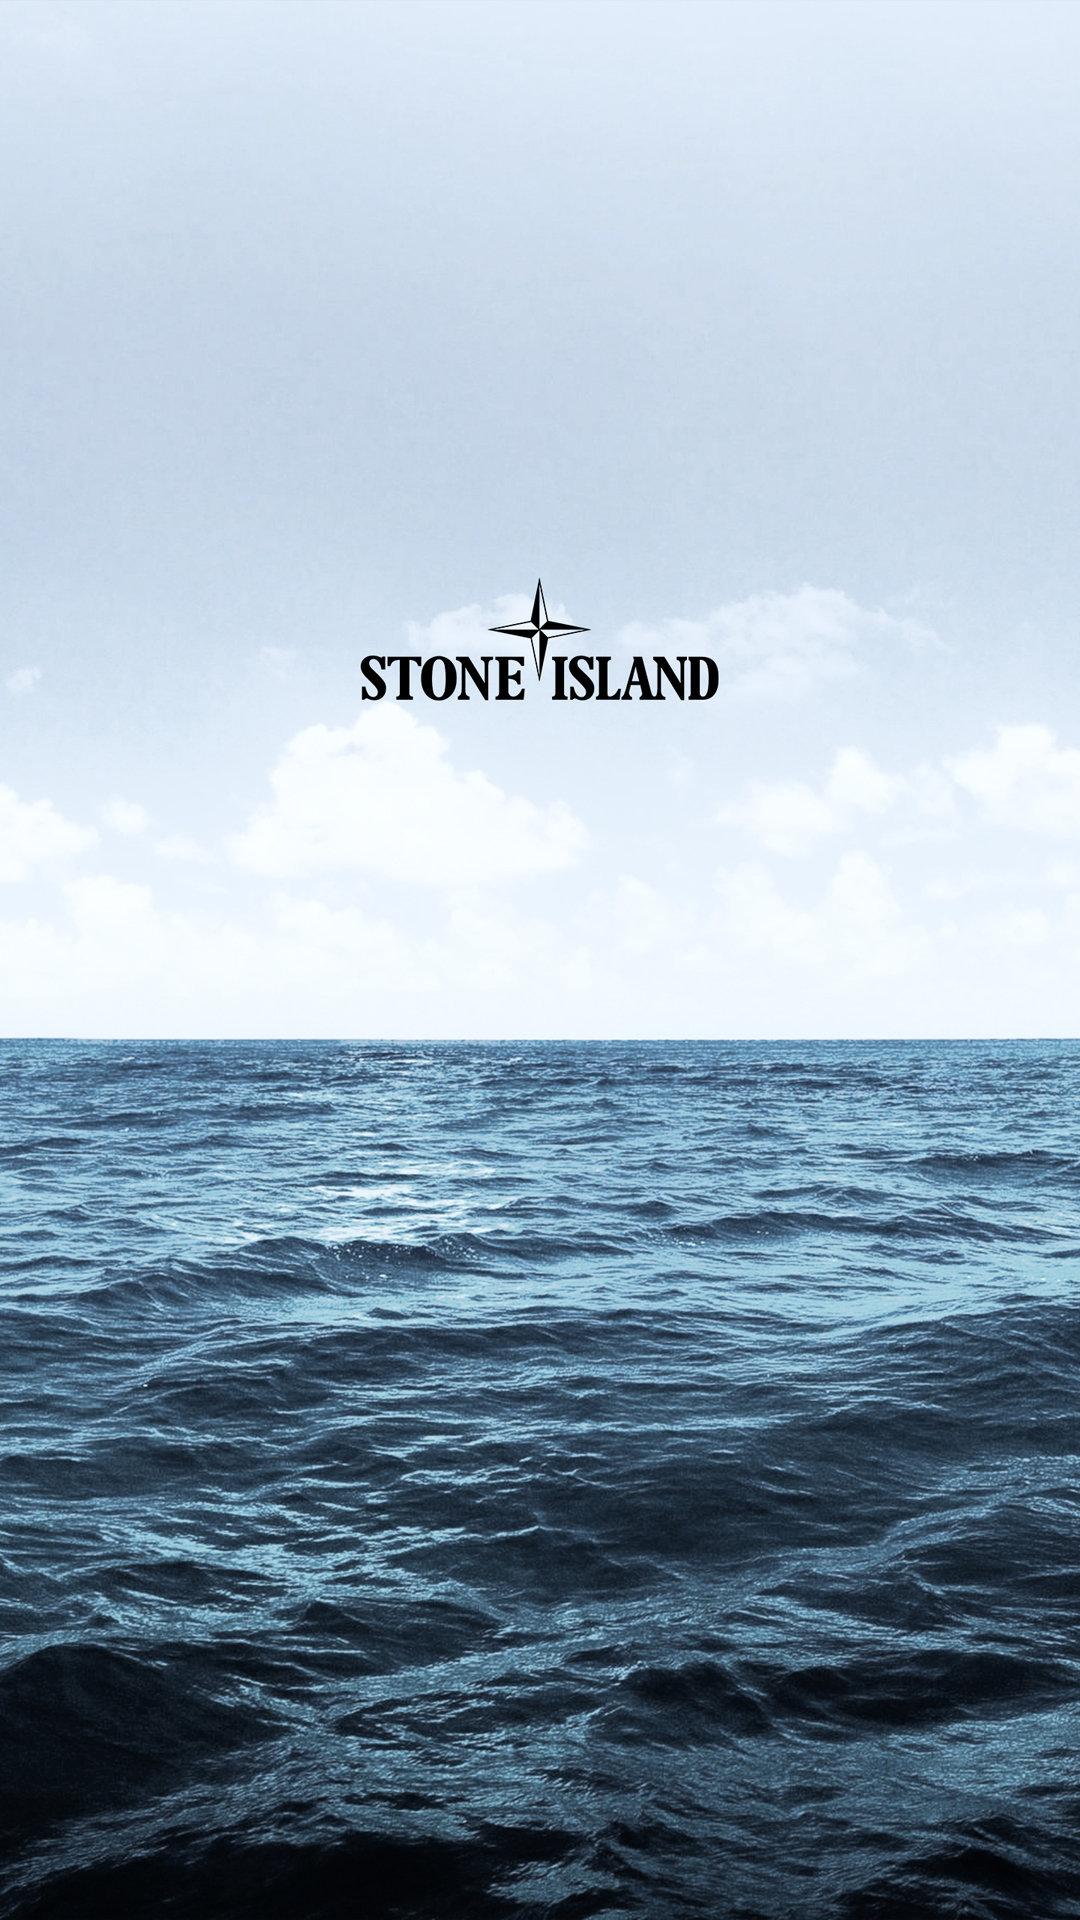 Stone Island Wallpaper